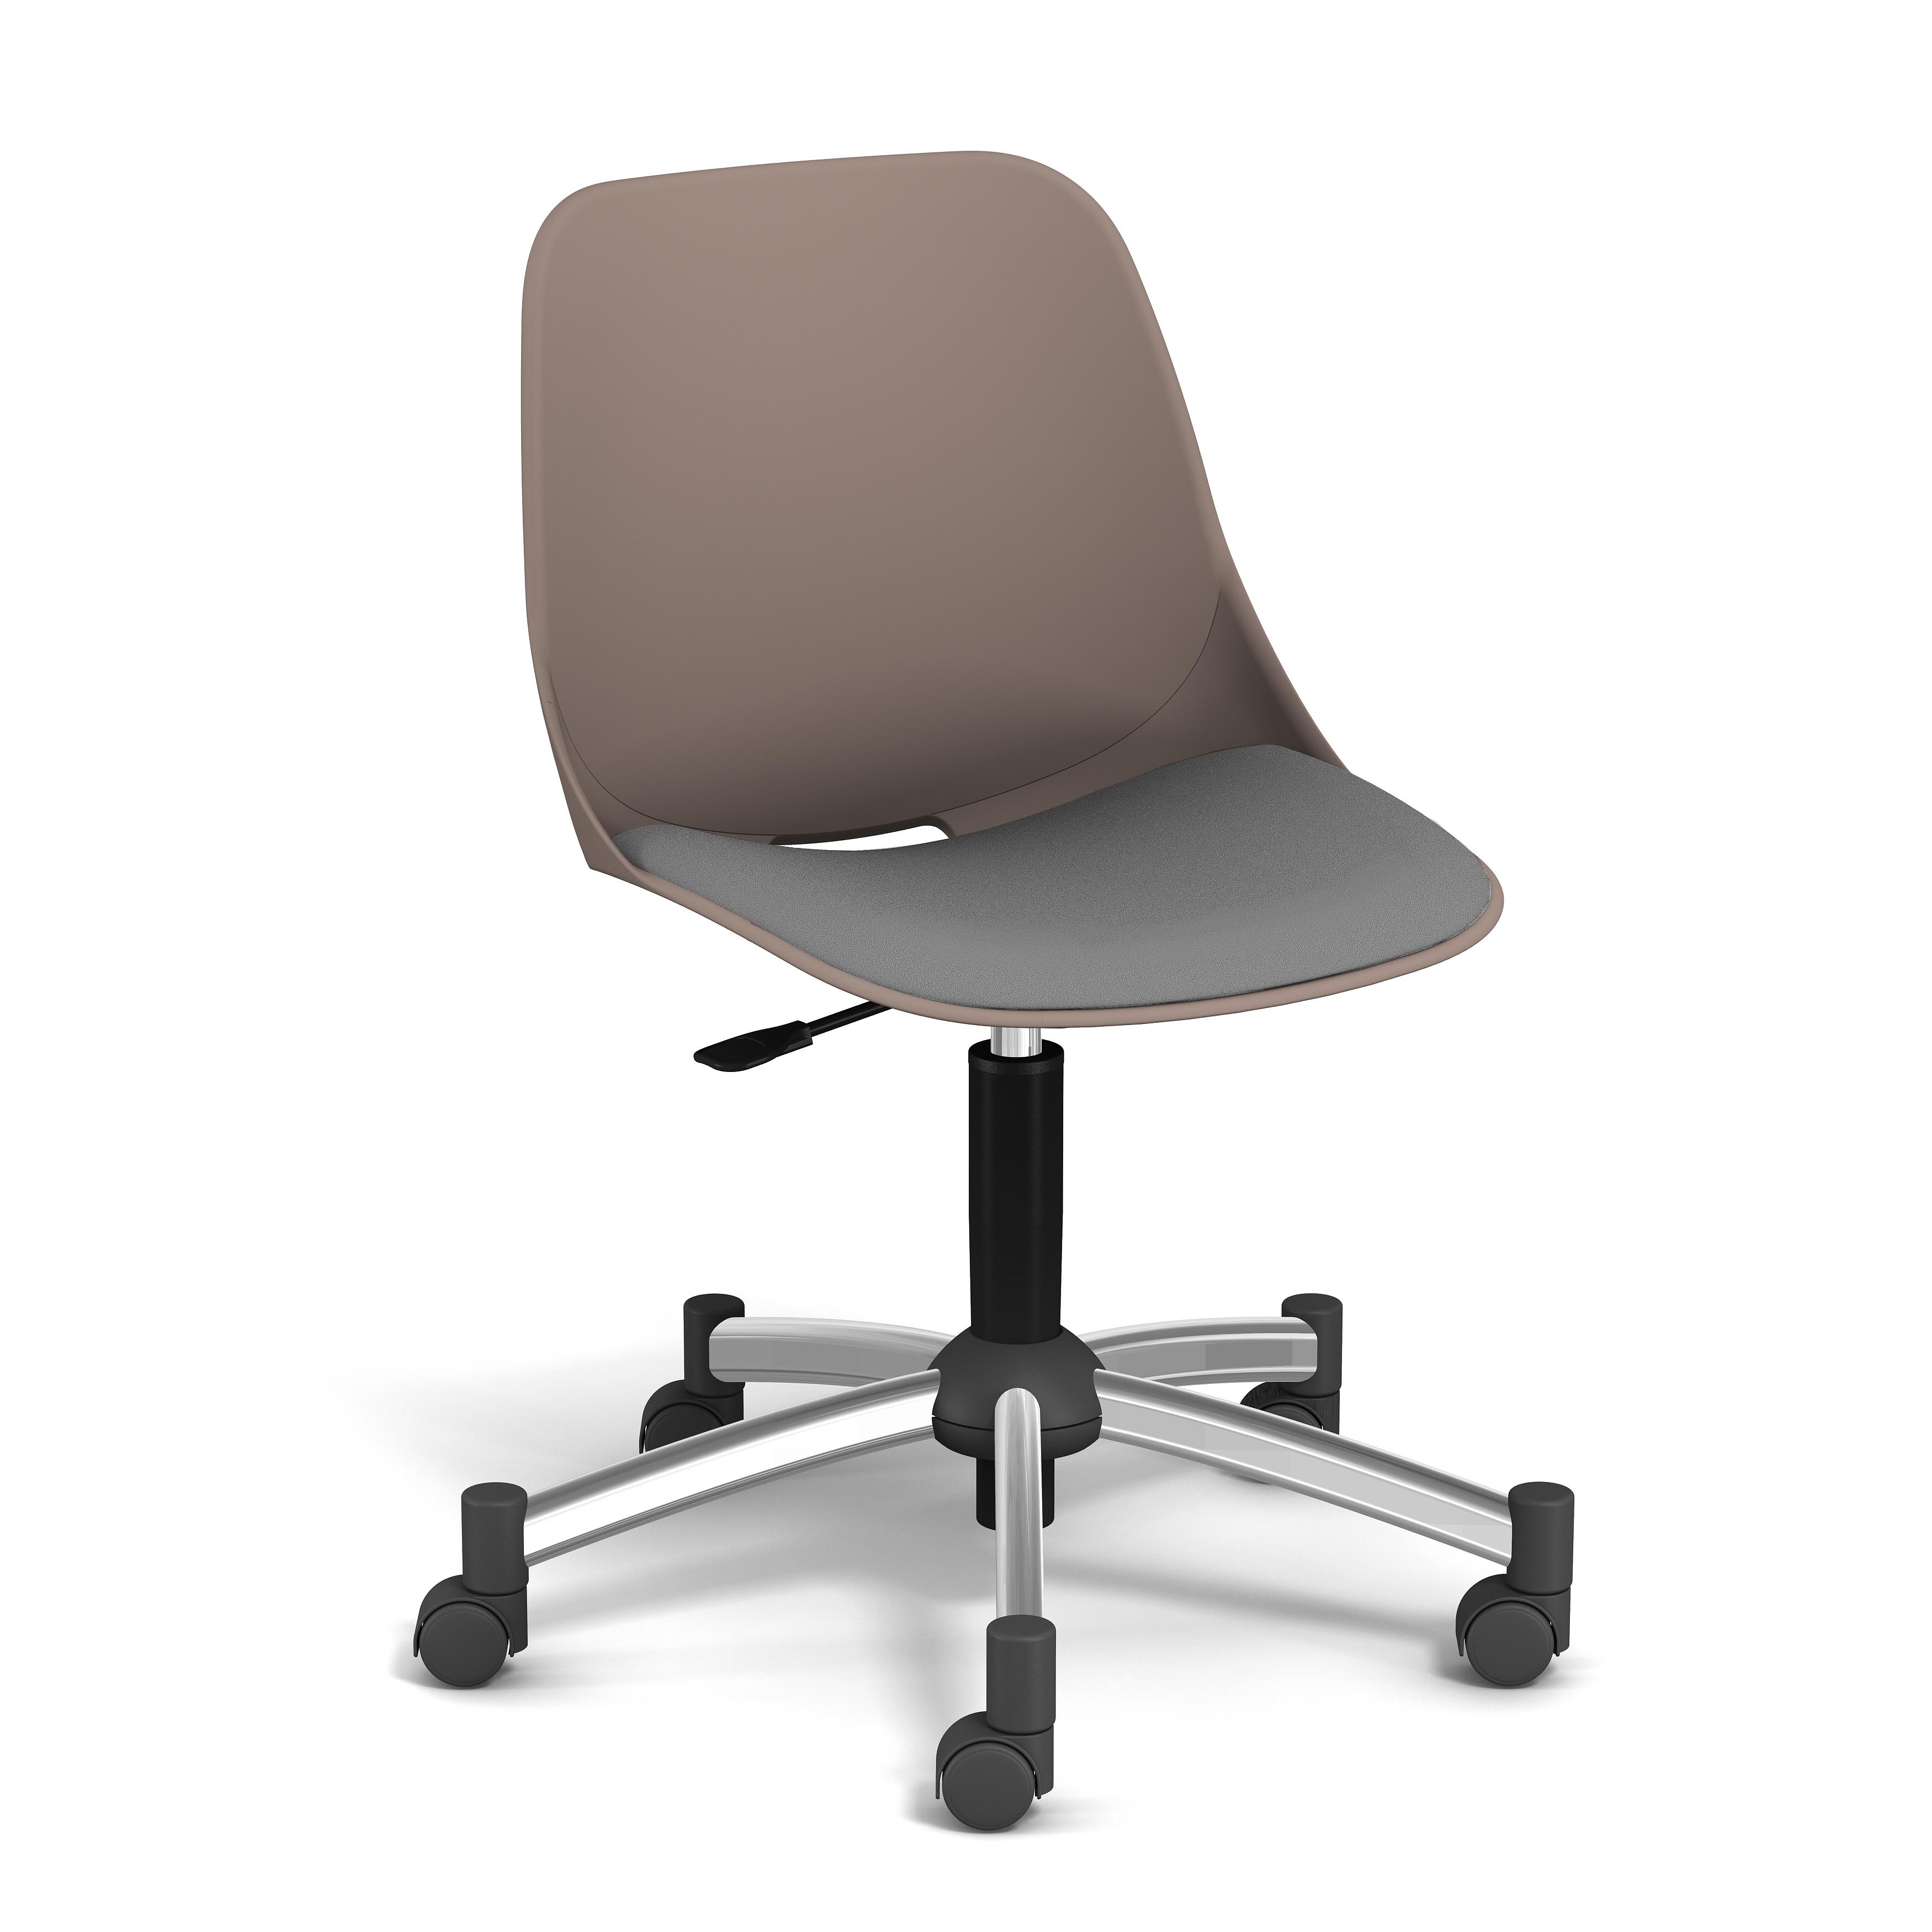 Chaise PALM - coque taupe - assise gris clair - base chromé